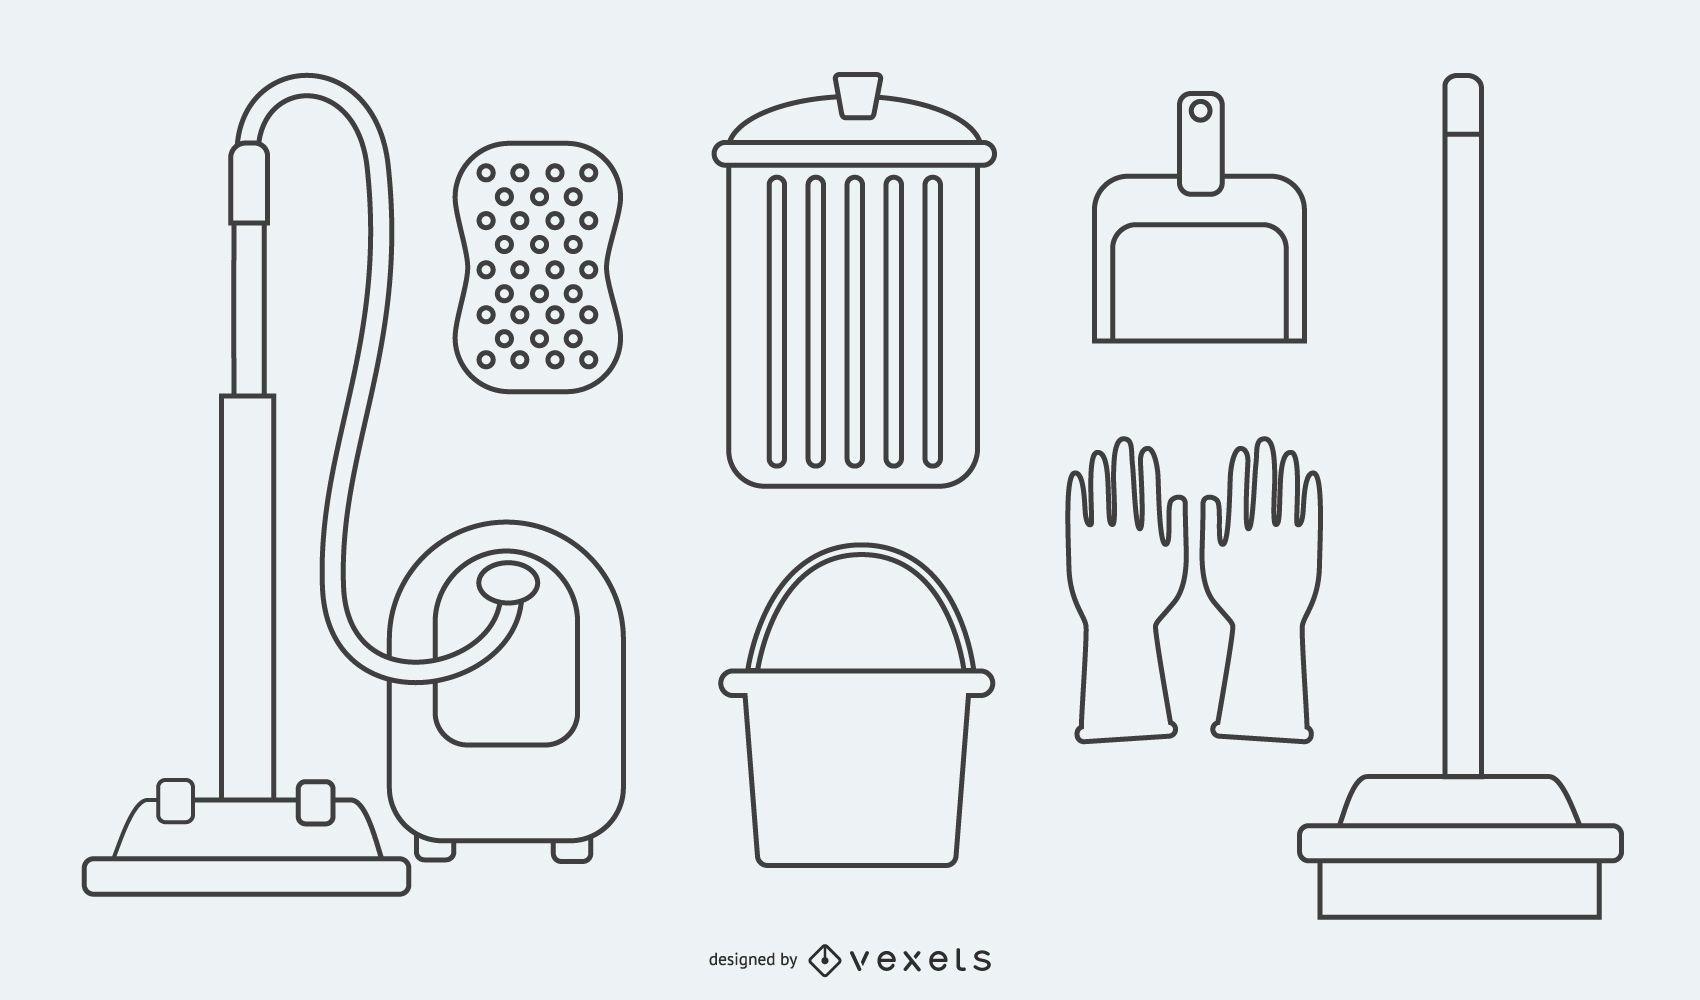 Desenho animado de utensílios de serviço de limpeza